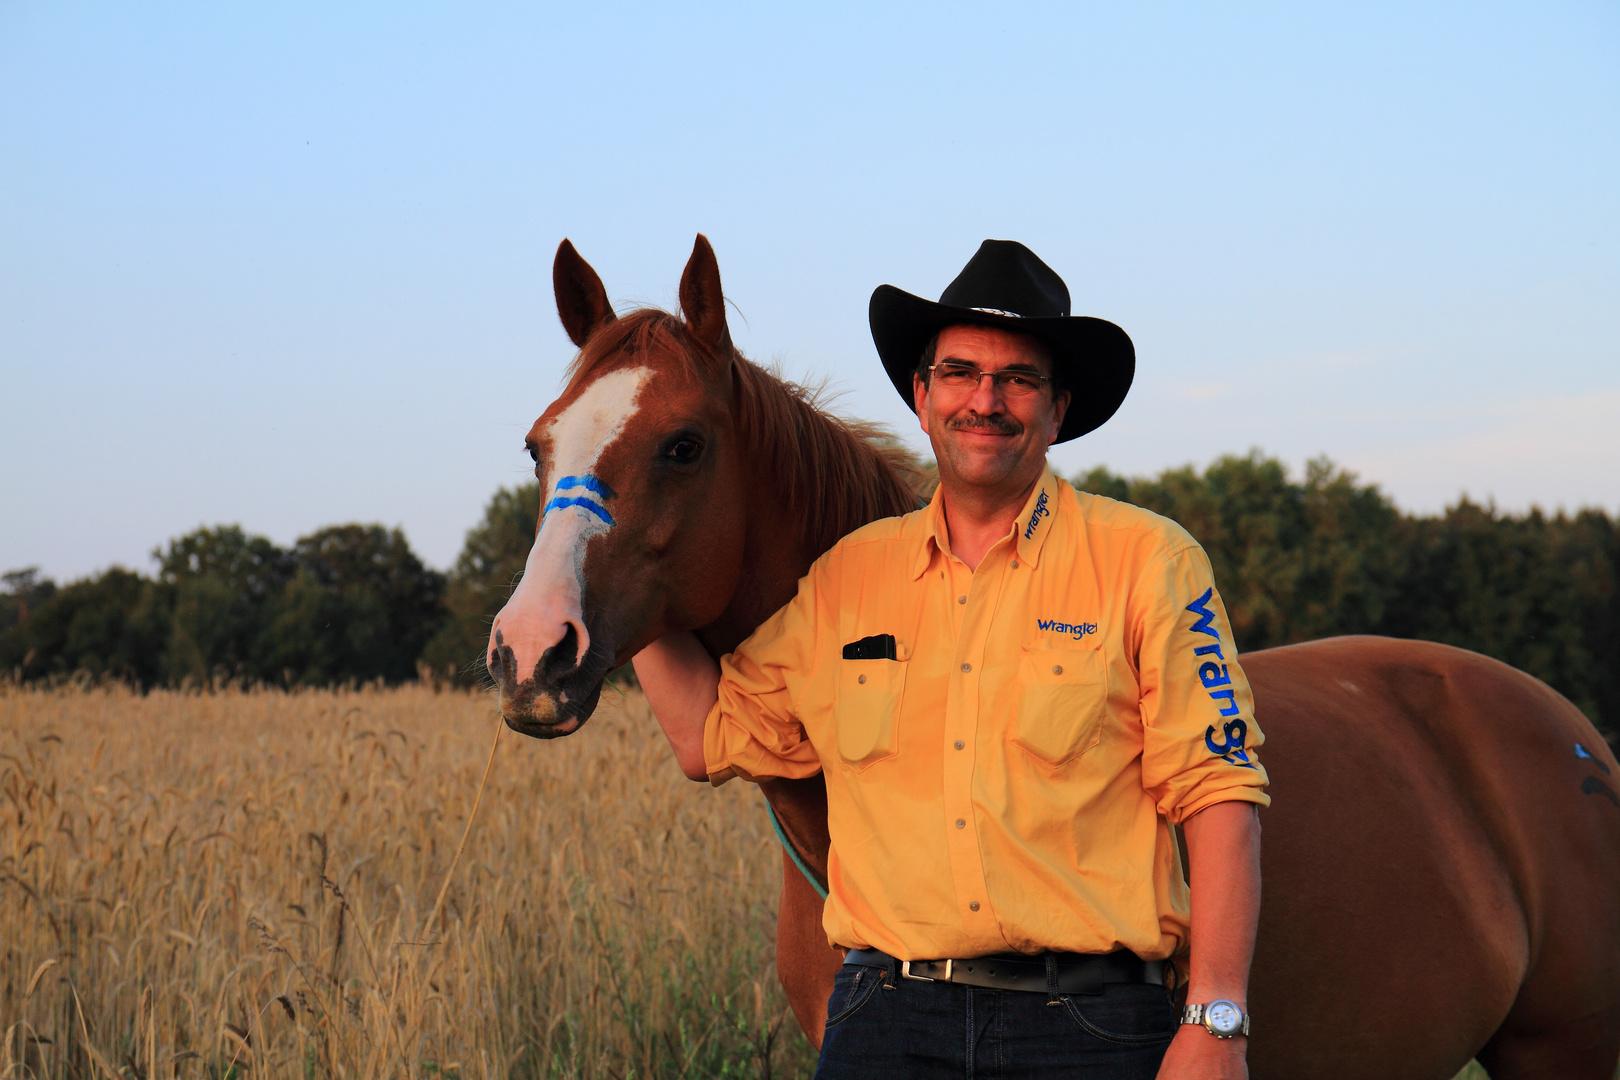 Mann mit paint horse auf dem Feld 2014 Spätsommer